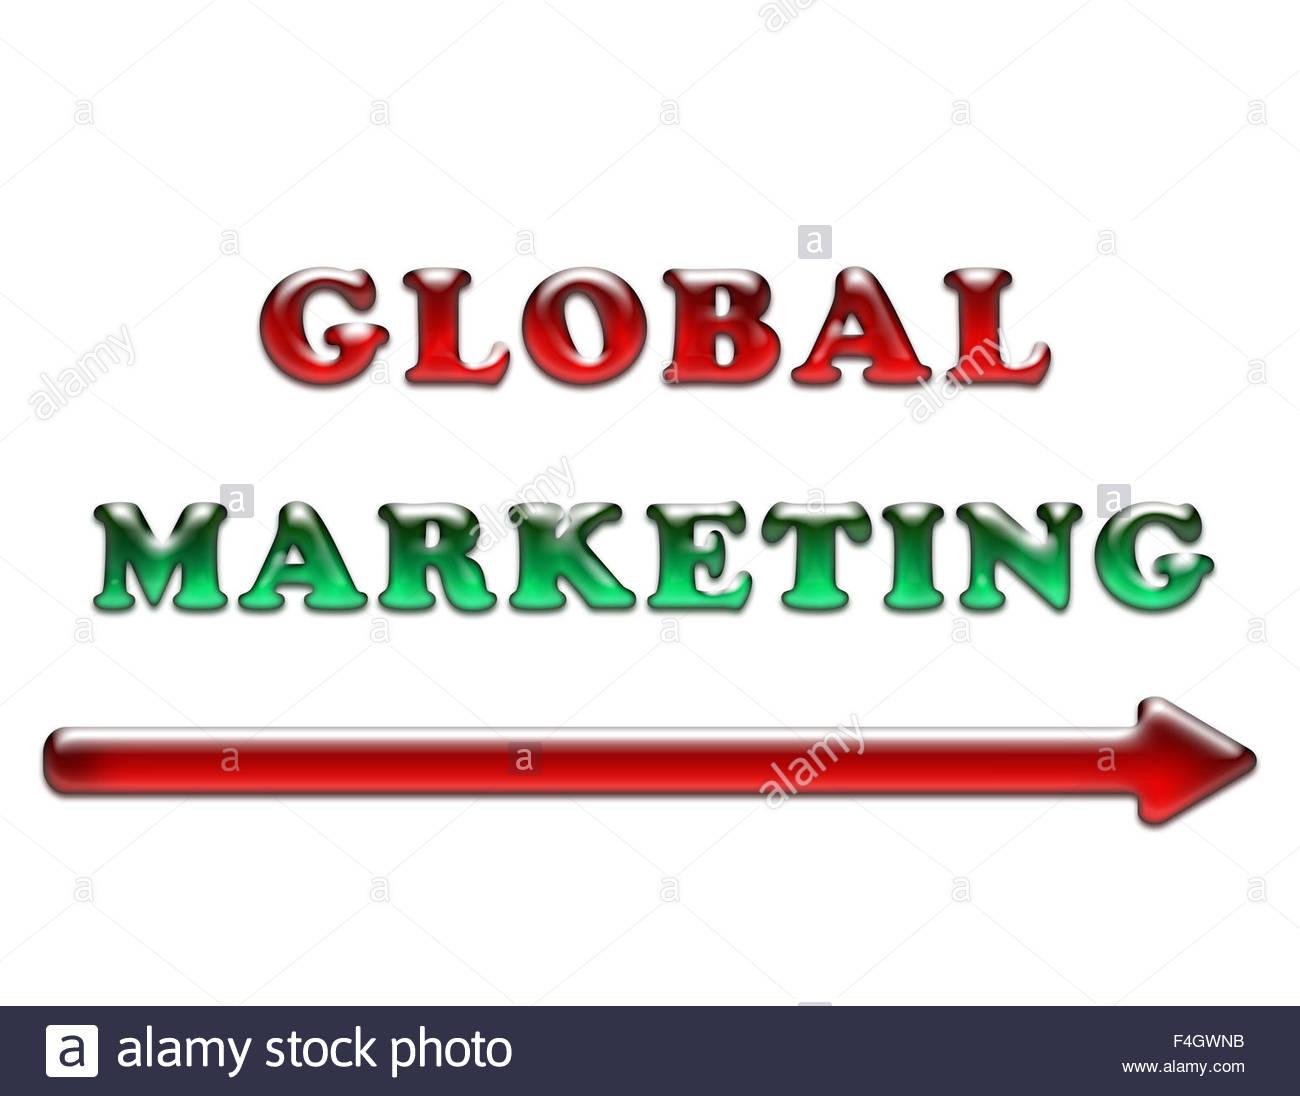 Global Marketing - Stock Image